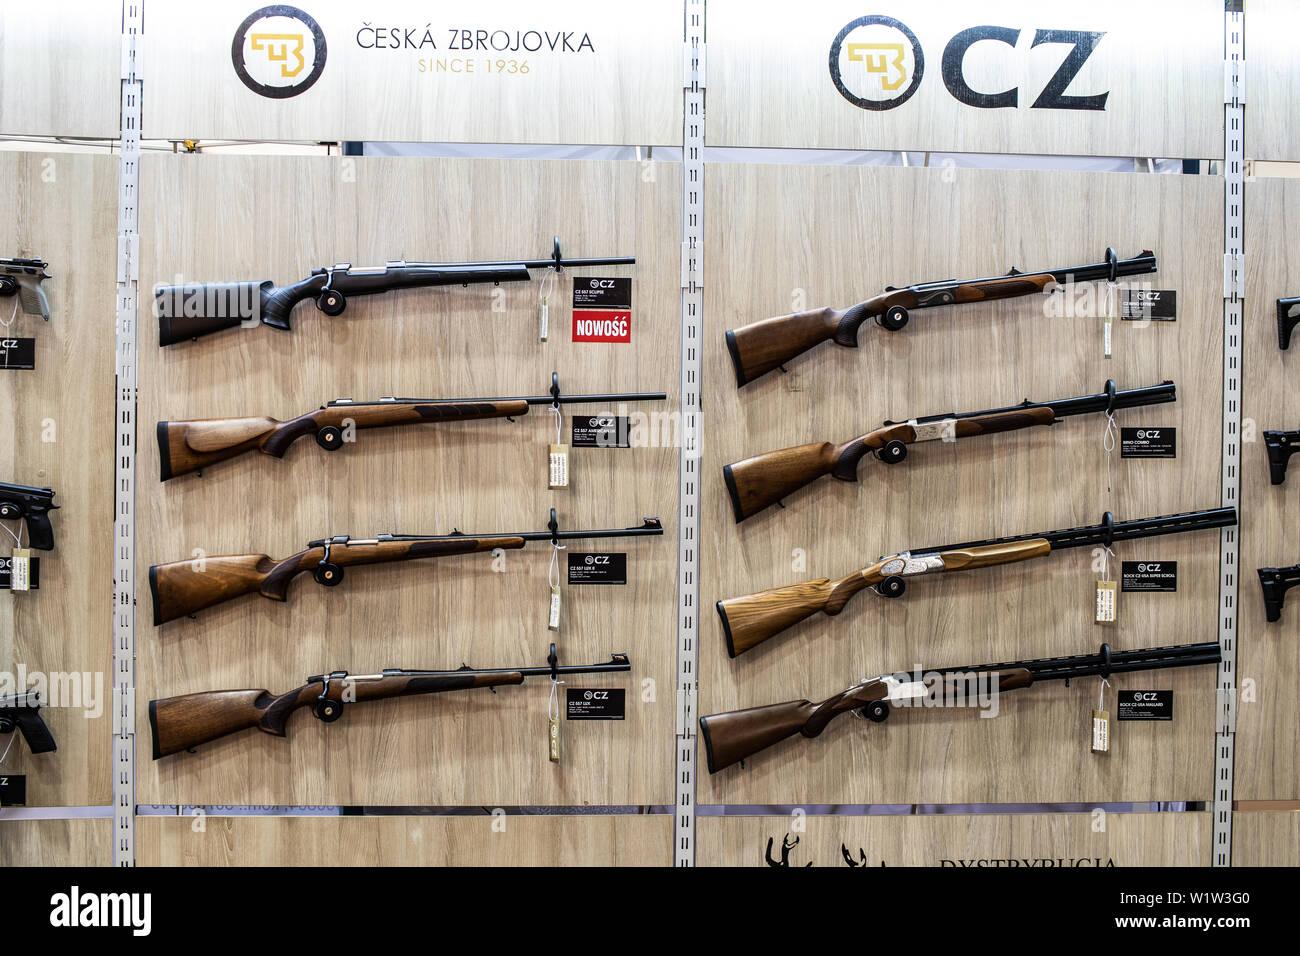 Semi Automatic Rifles Stock Photos & Semi Automatic Rifles